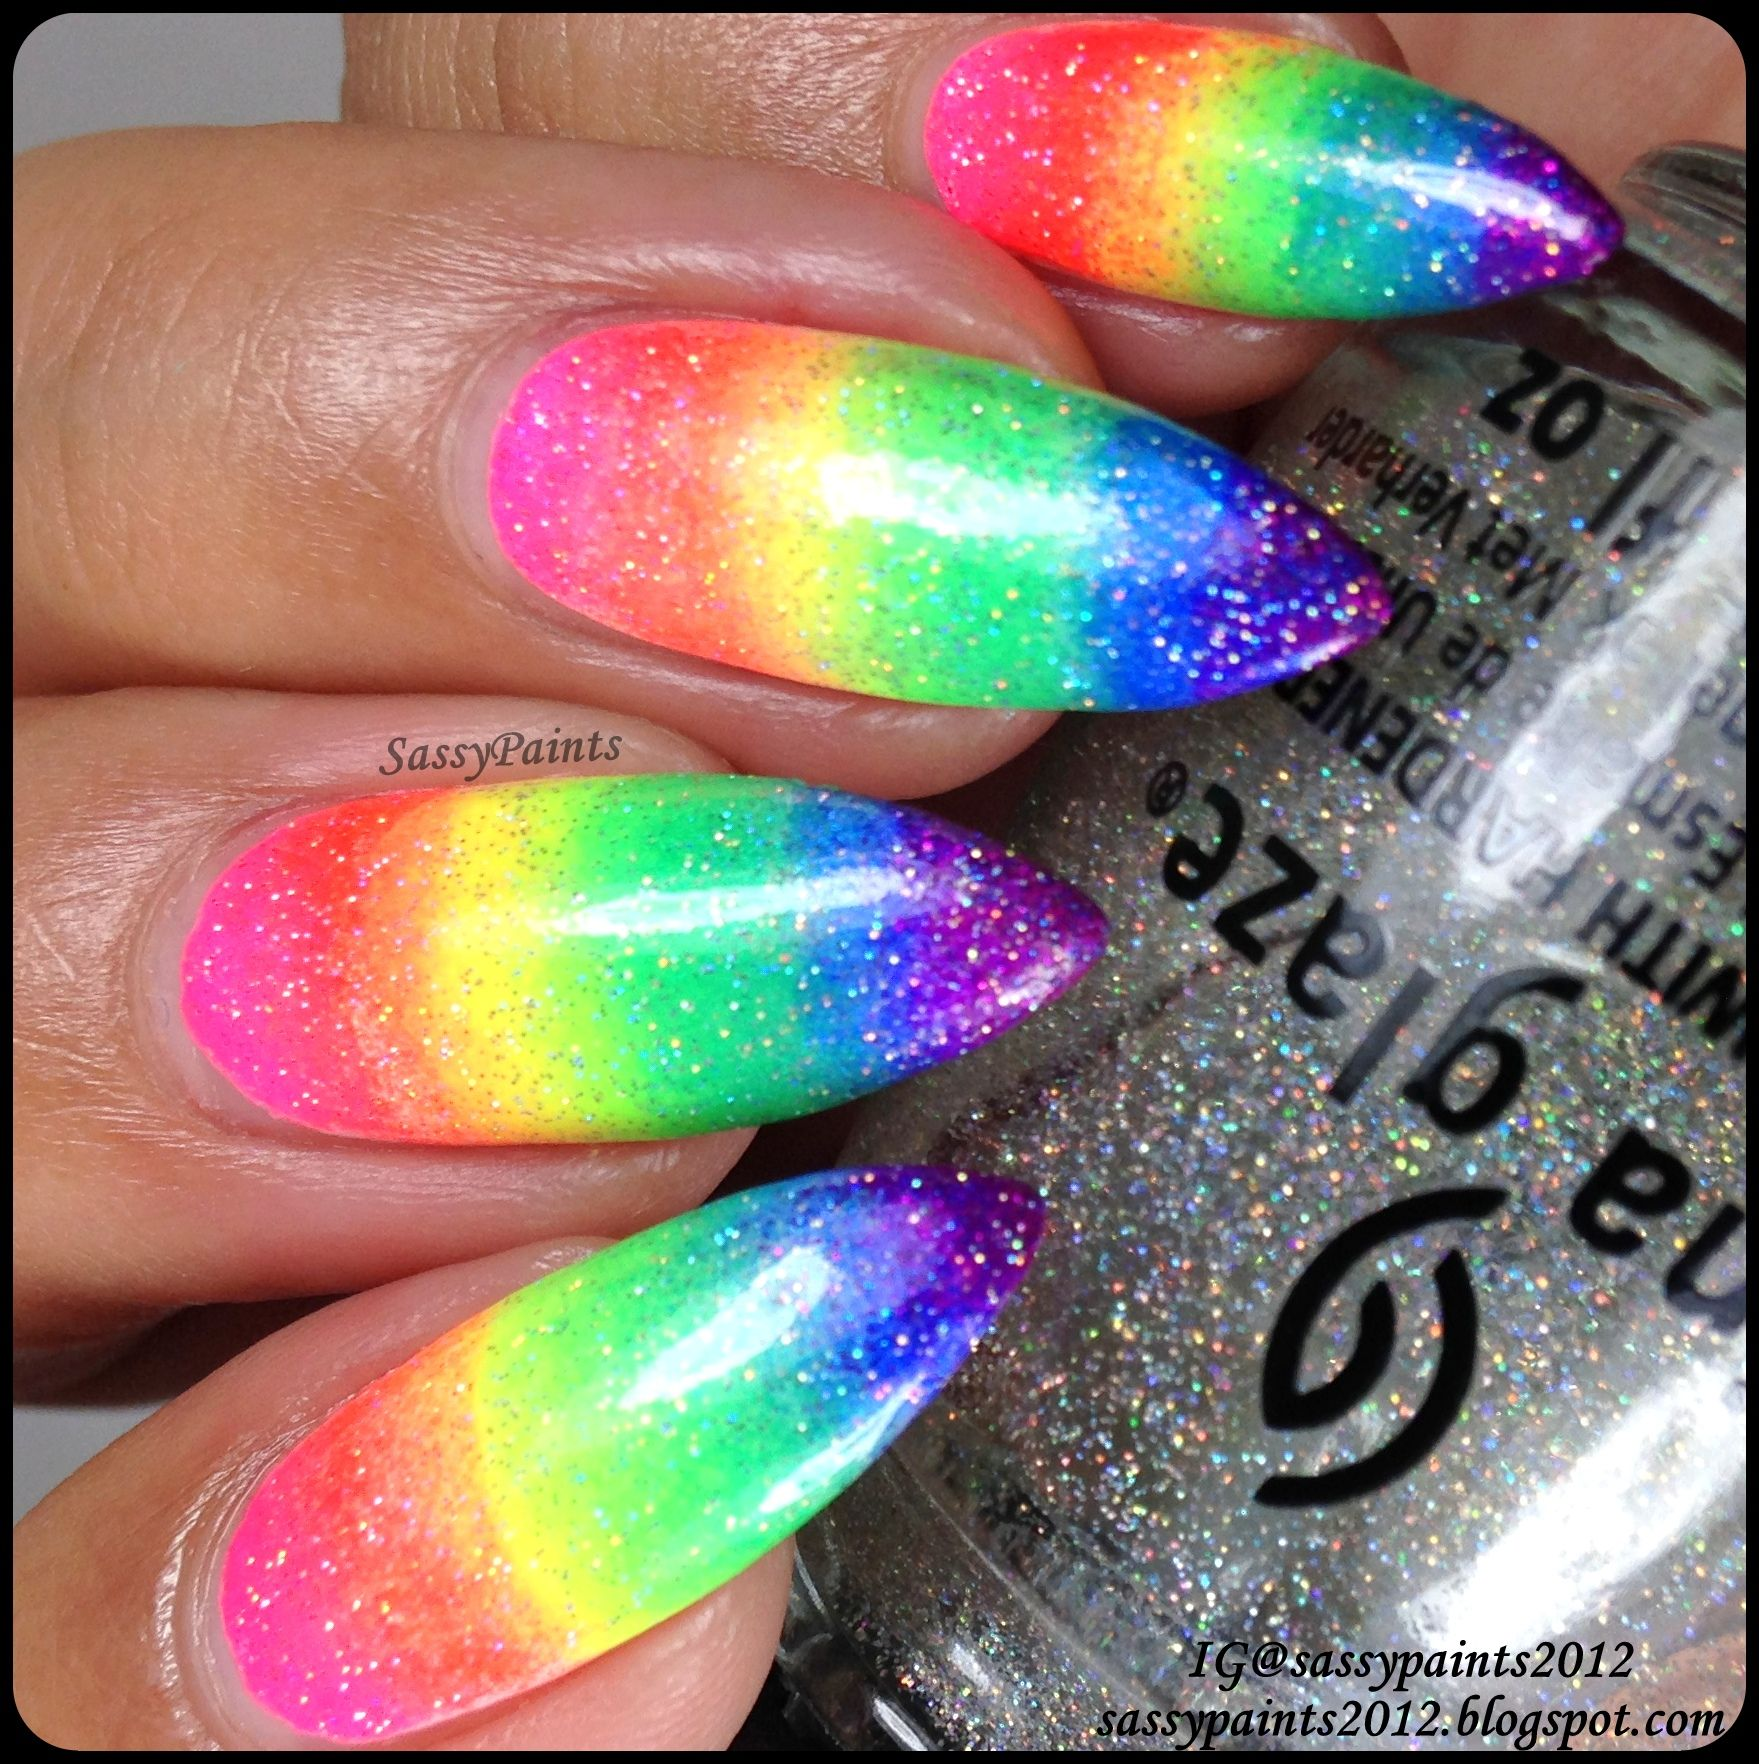 Sassy Paints: China Glaze Neon Rainbow Gradient   Nails and hair ...